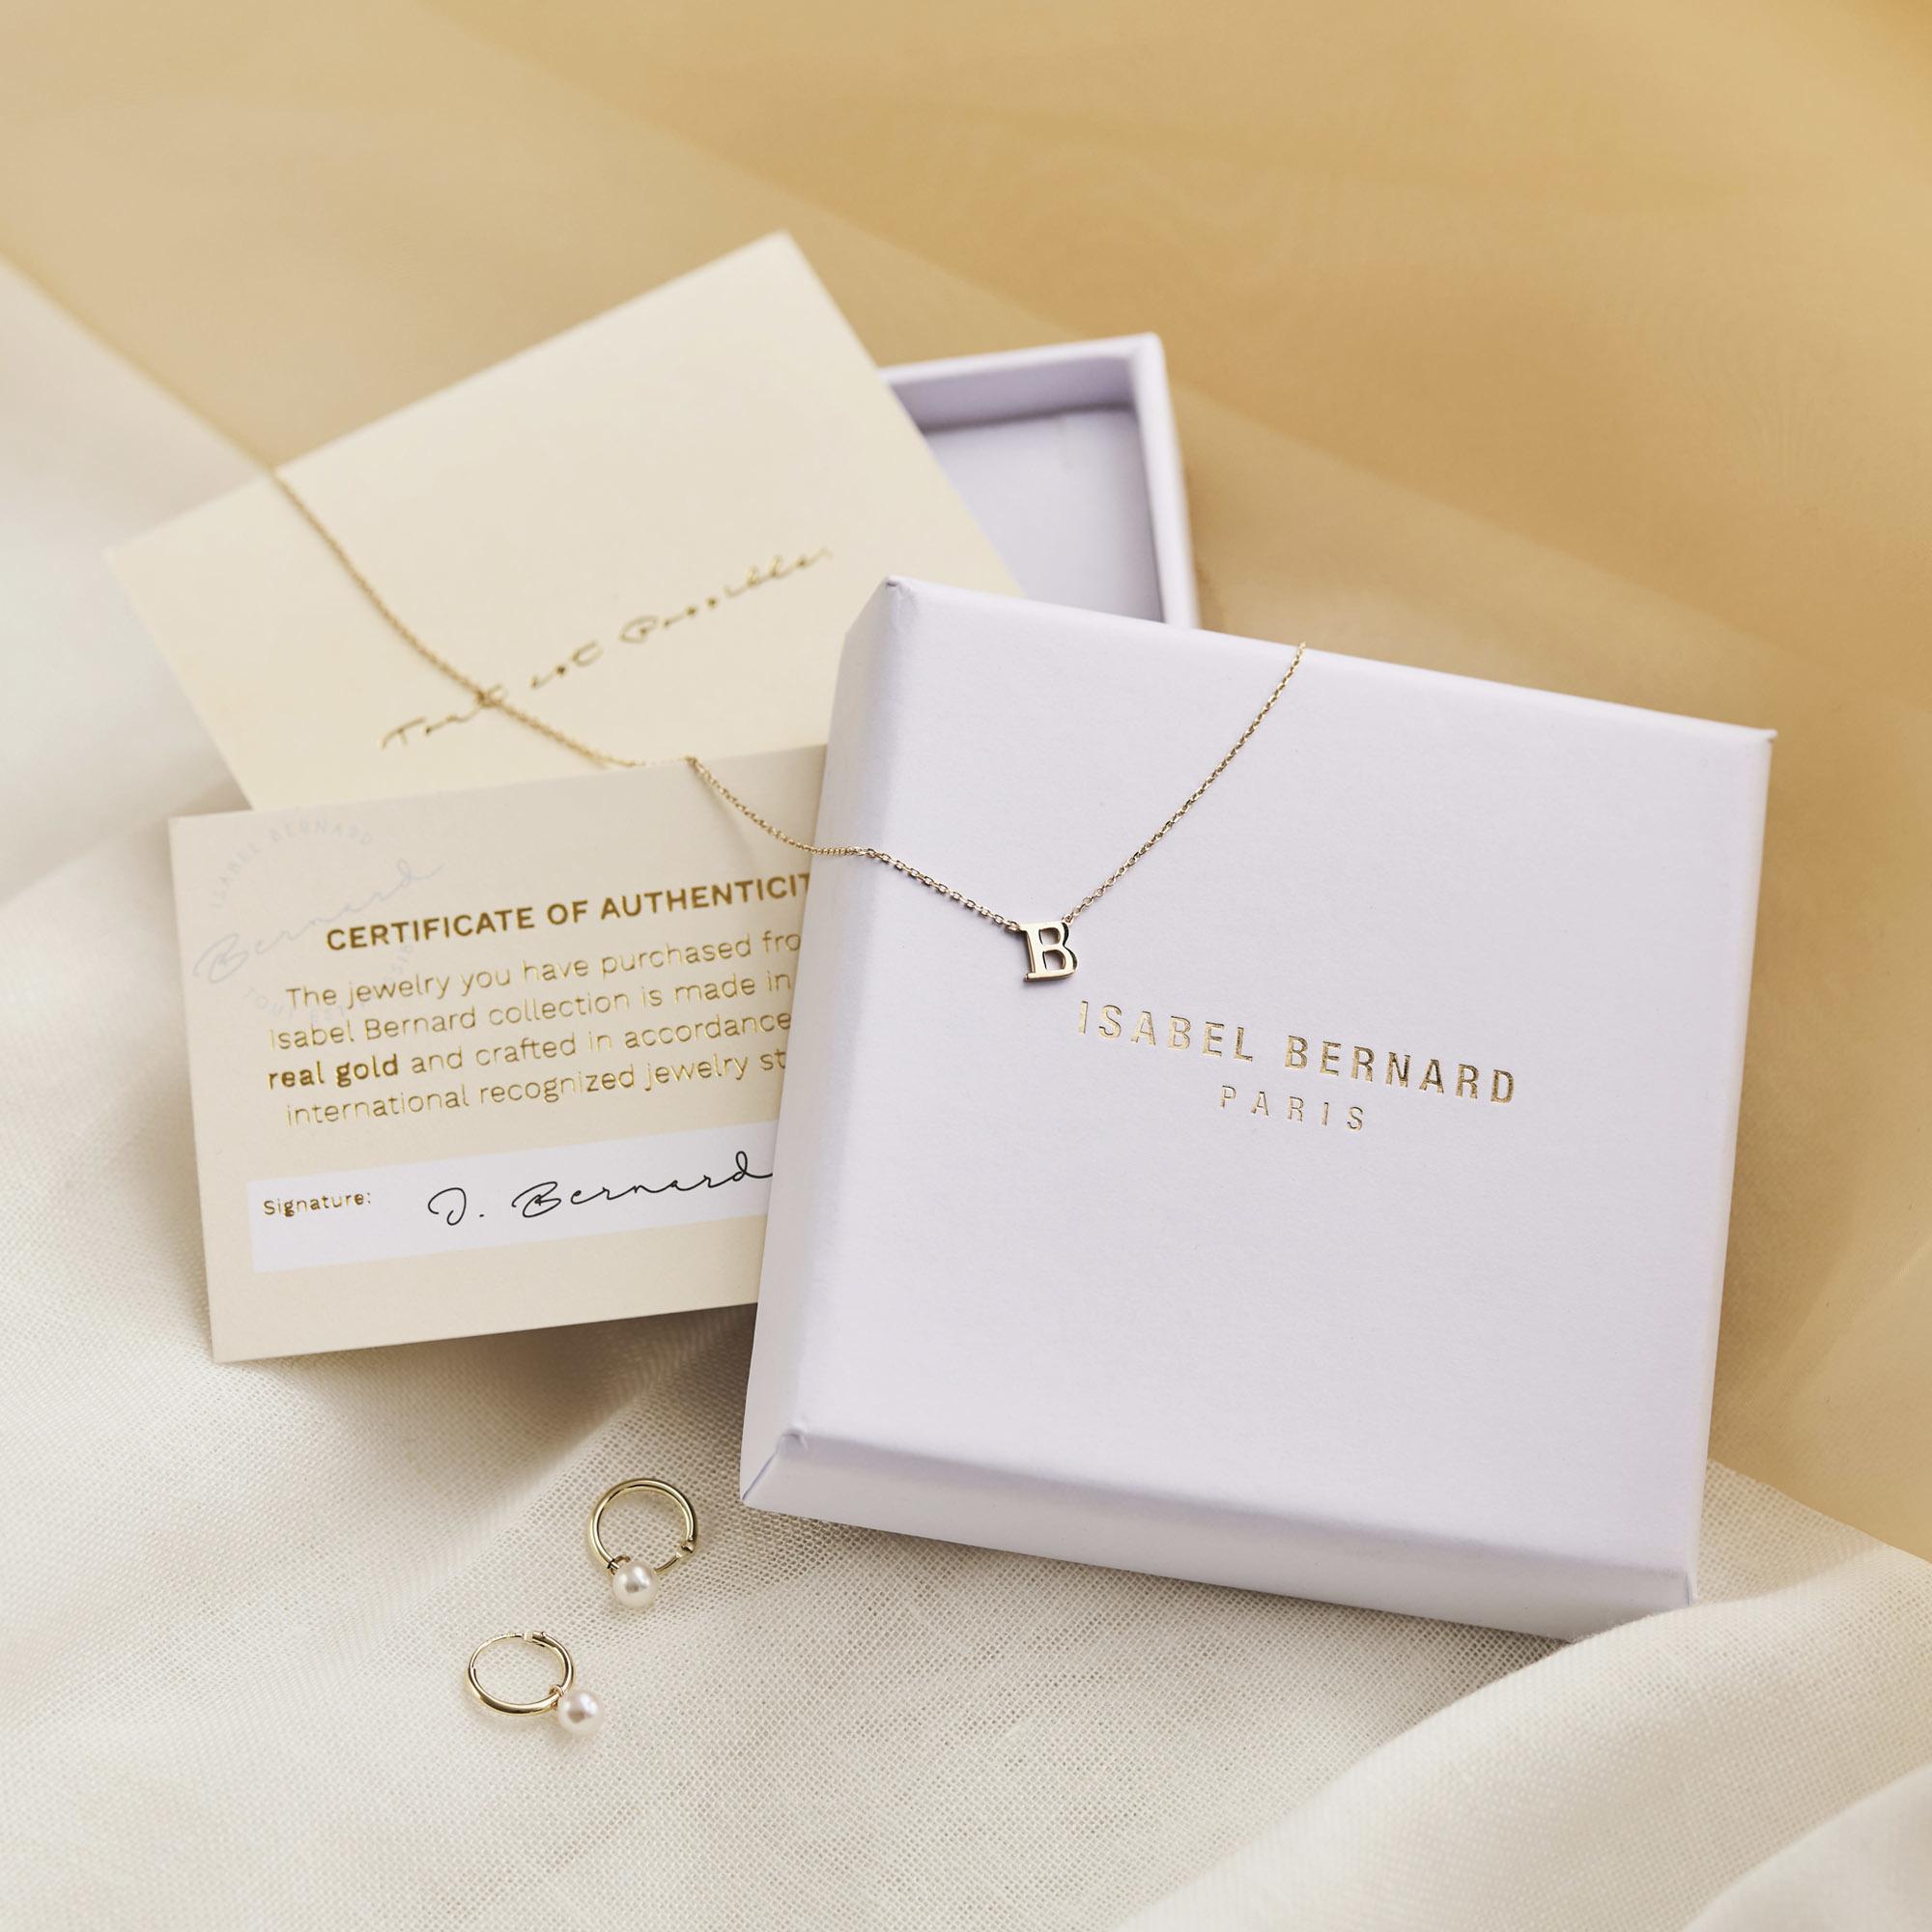 Isabel Bernard Rivoli Coline 14 karat gold bracelet rings with rings